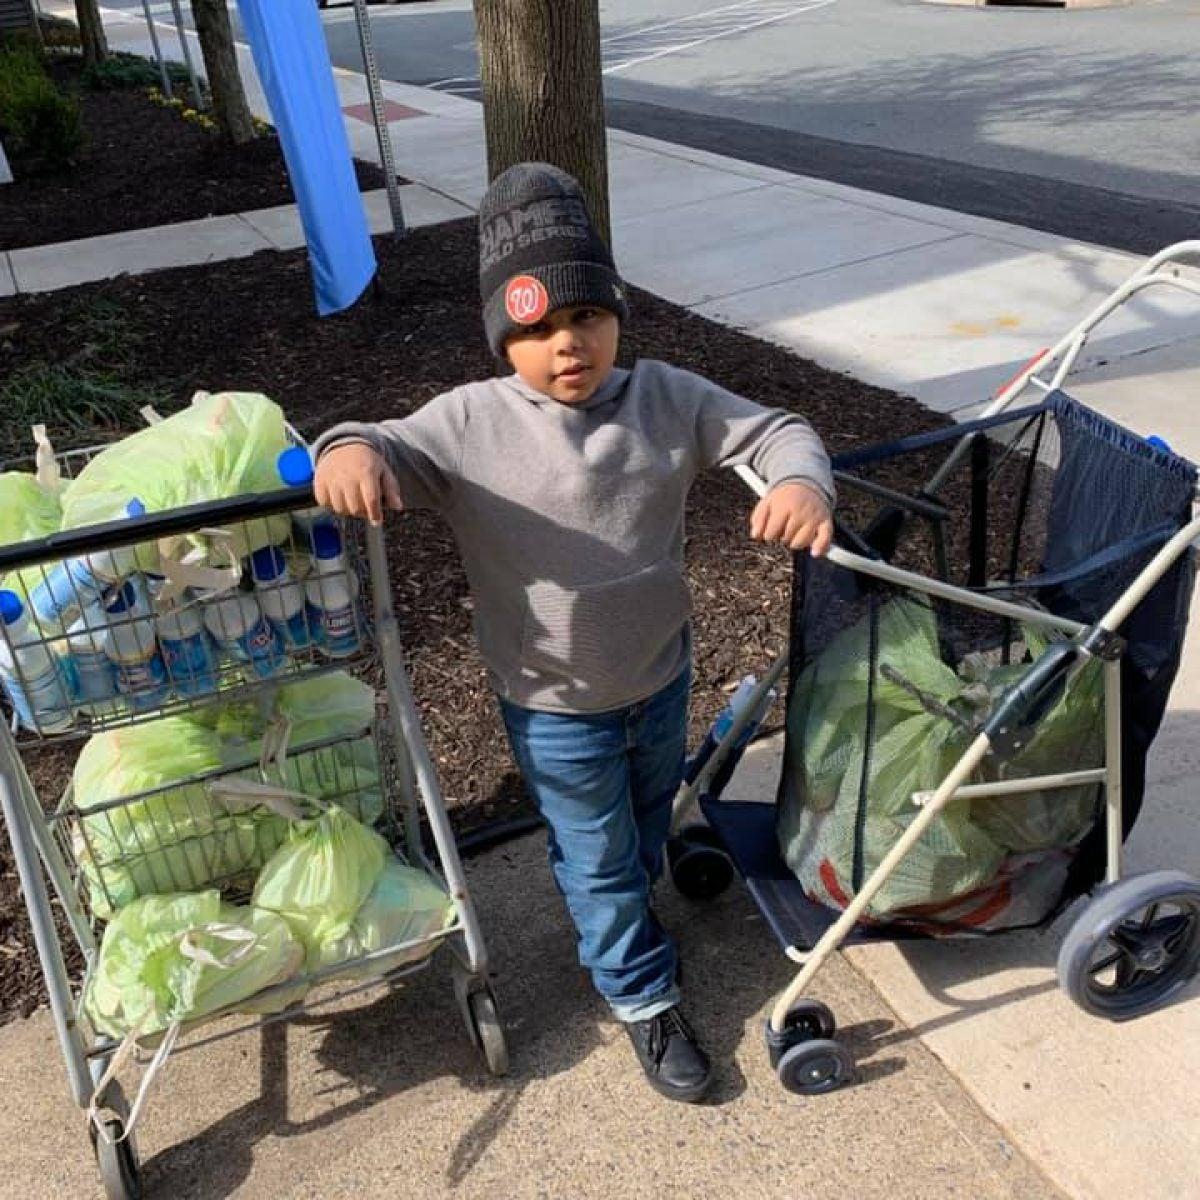 Maryland 7-Year-Old Creates Coronavirus Care Packages For Seniors